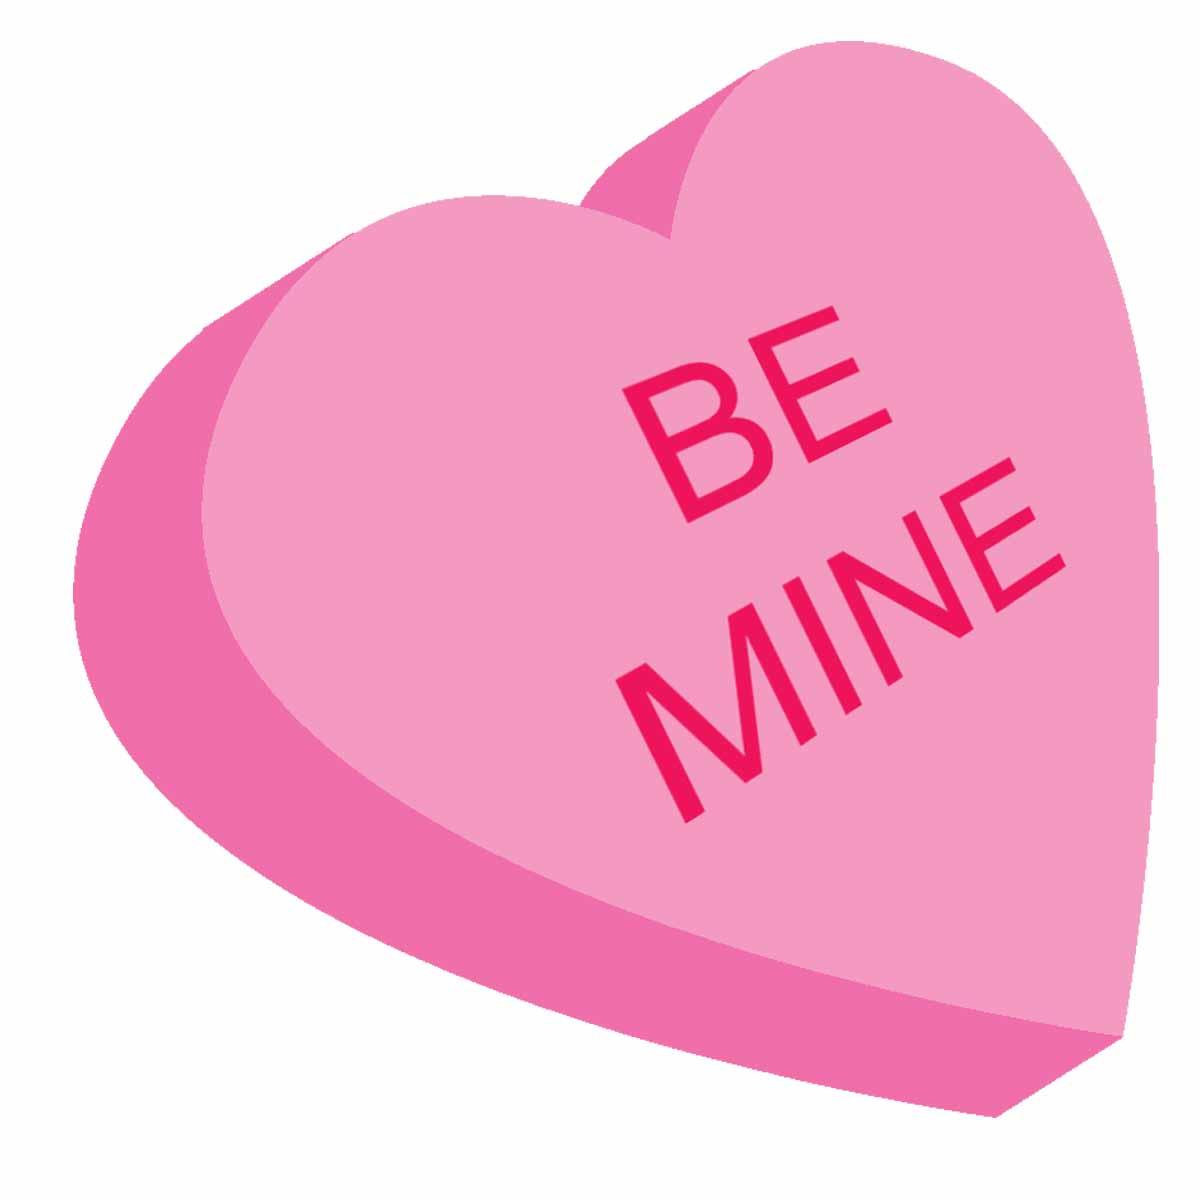 Valentines free clip art - .